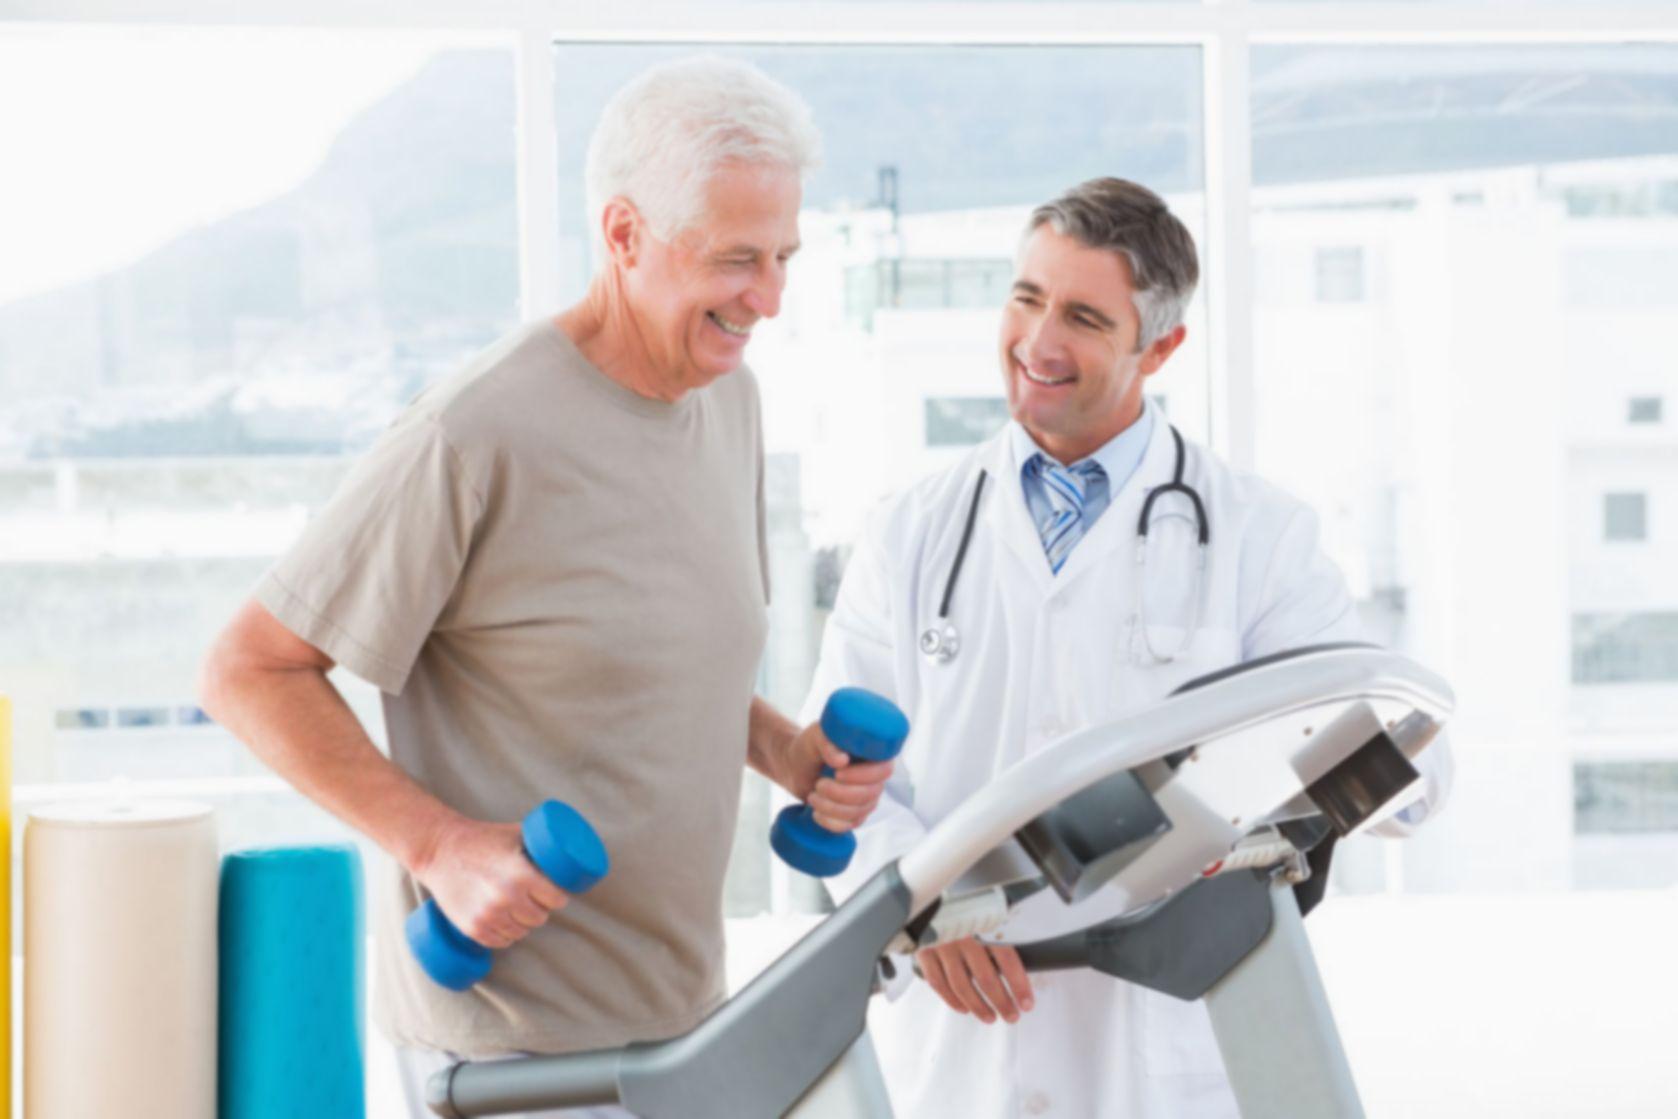 Curso de Ejercicio Físico Terapéutico en Rehabilitación Cardiaca ...